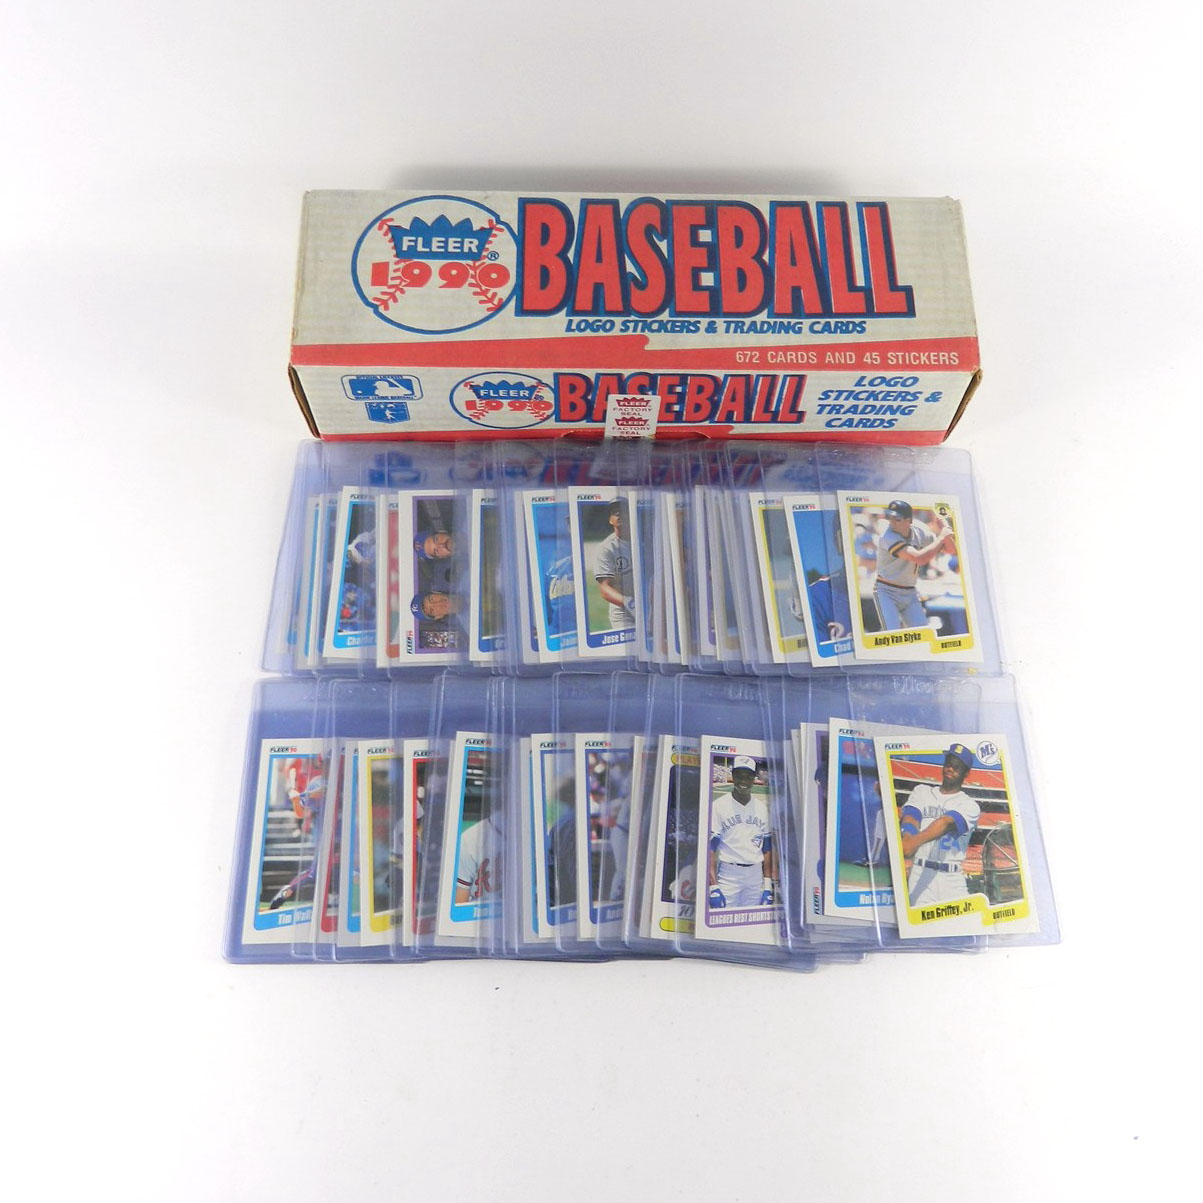 1990 Fleer Baseball Complete Set Key Cards In Card Savers